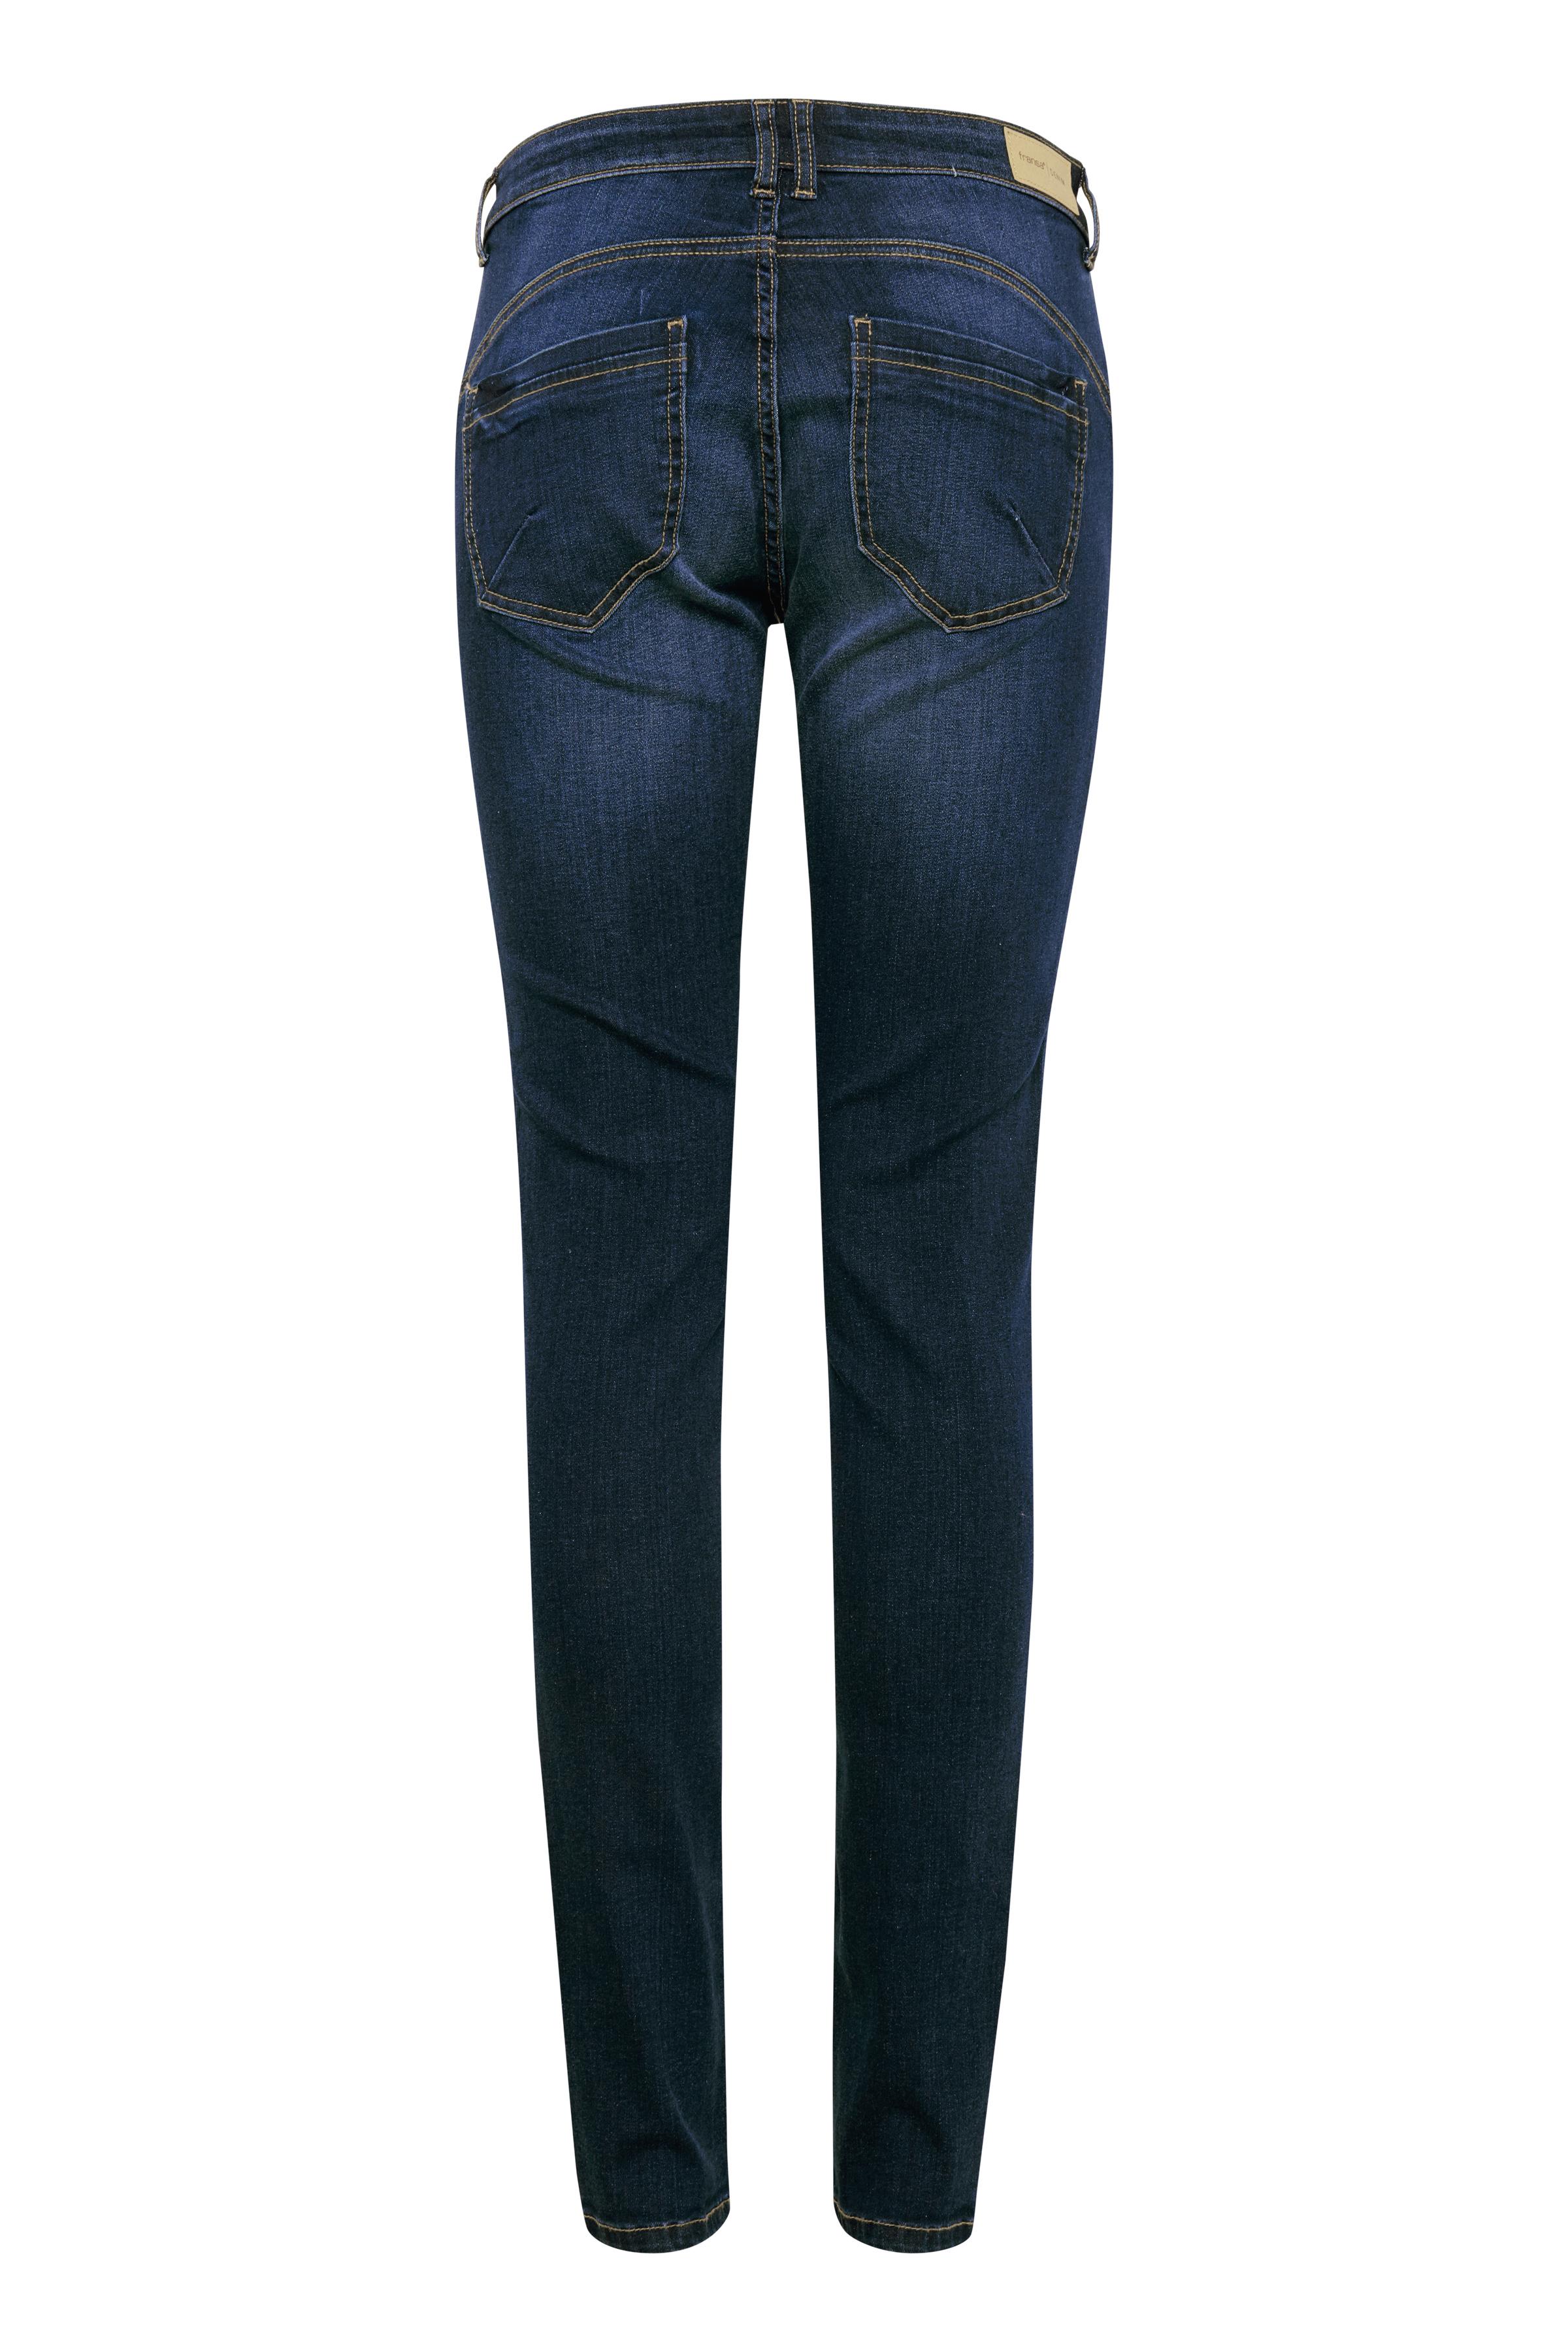 Mørk denimblå Jeans fra Fransa – Køb Mørk denimblå Jeans fra str. 34-46 her